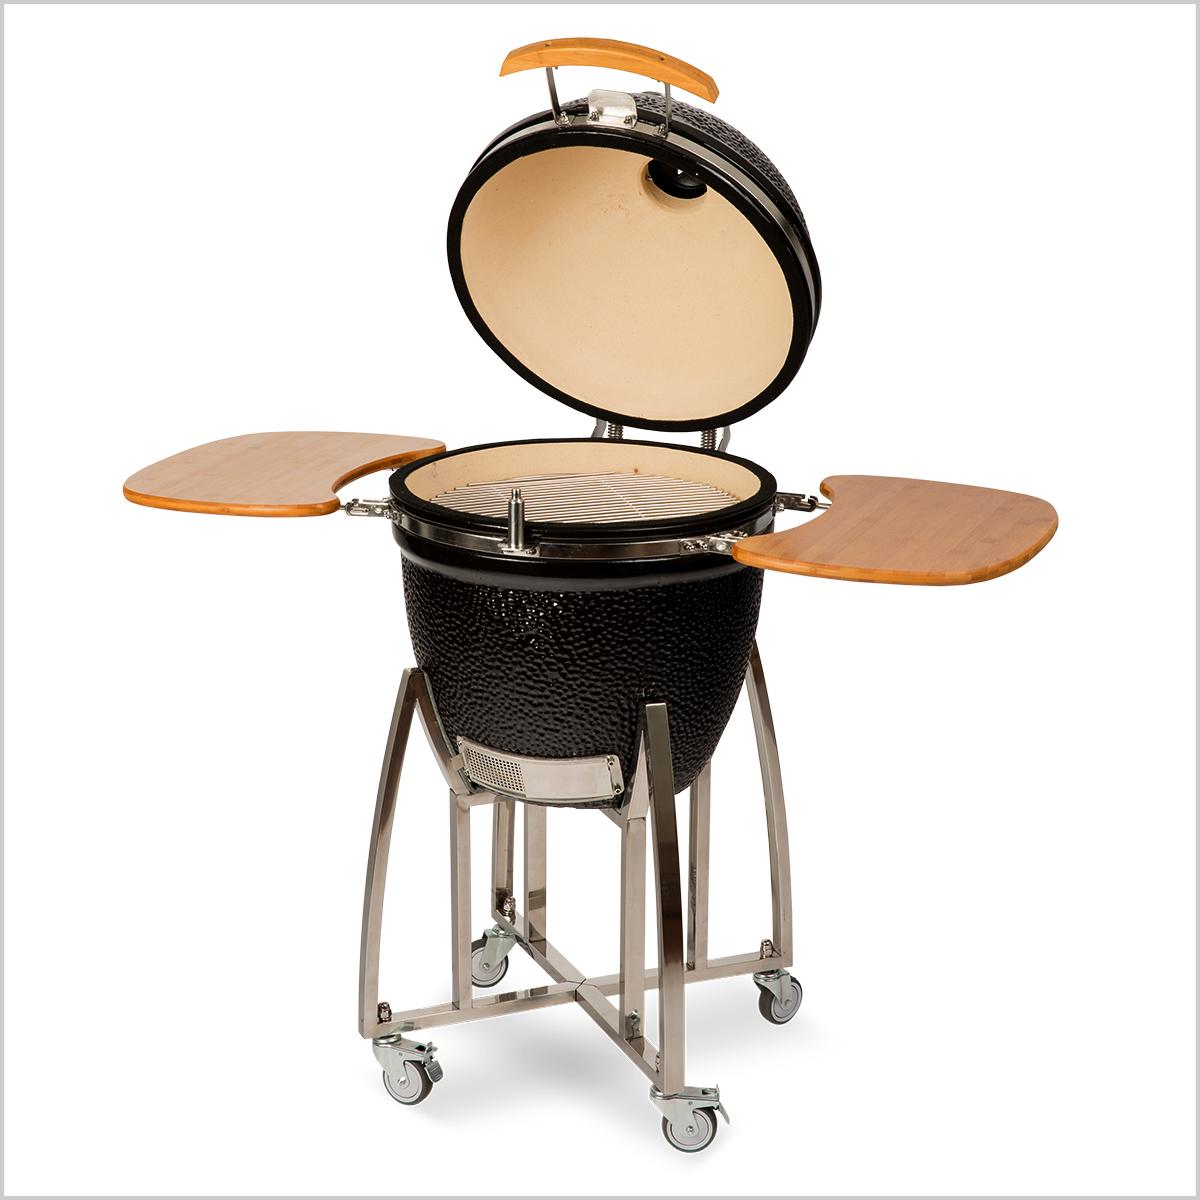 Auplex Kamado Model 2017 Large zwart 21 inch keramische barbecue